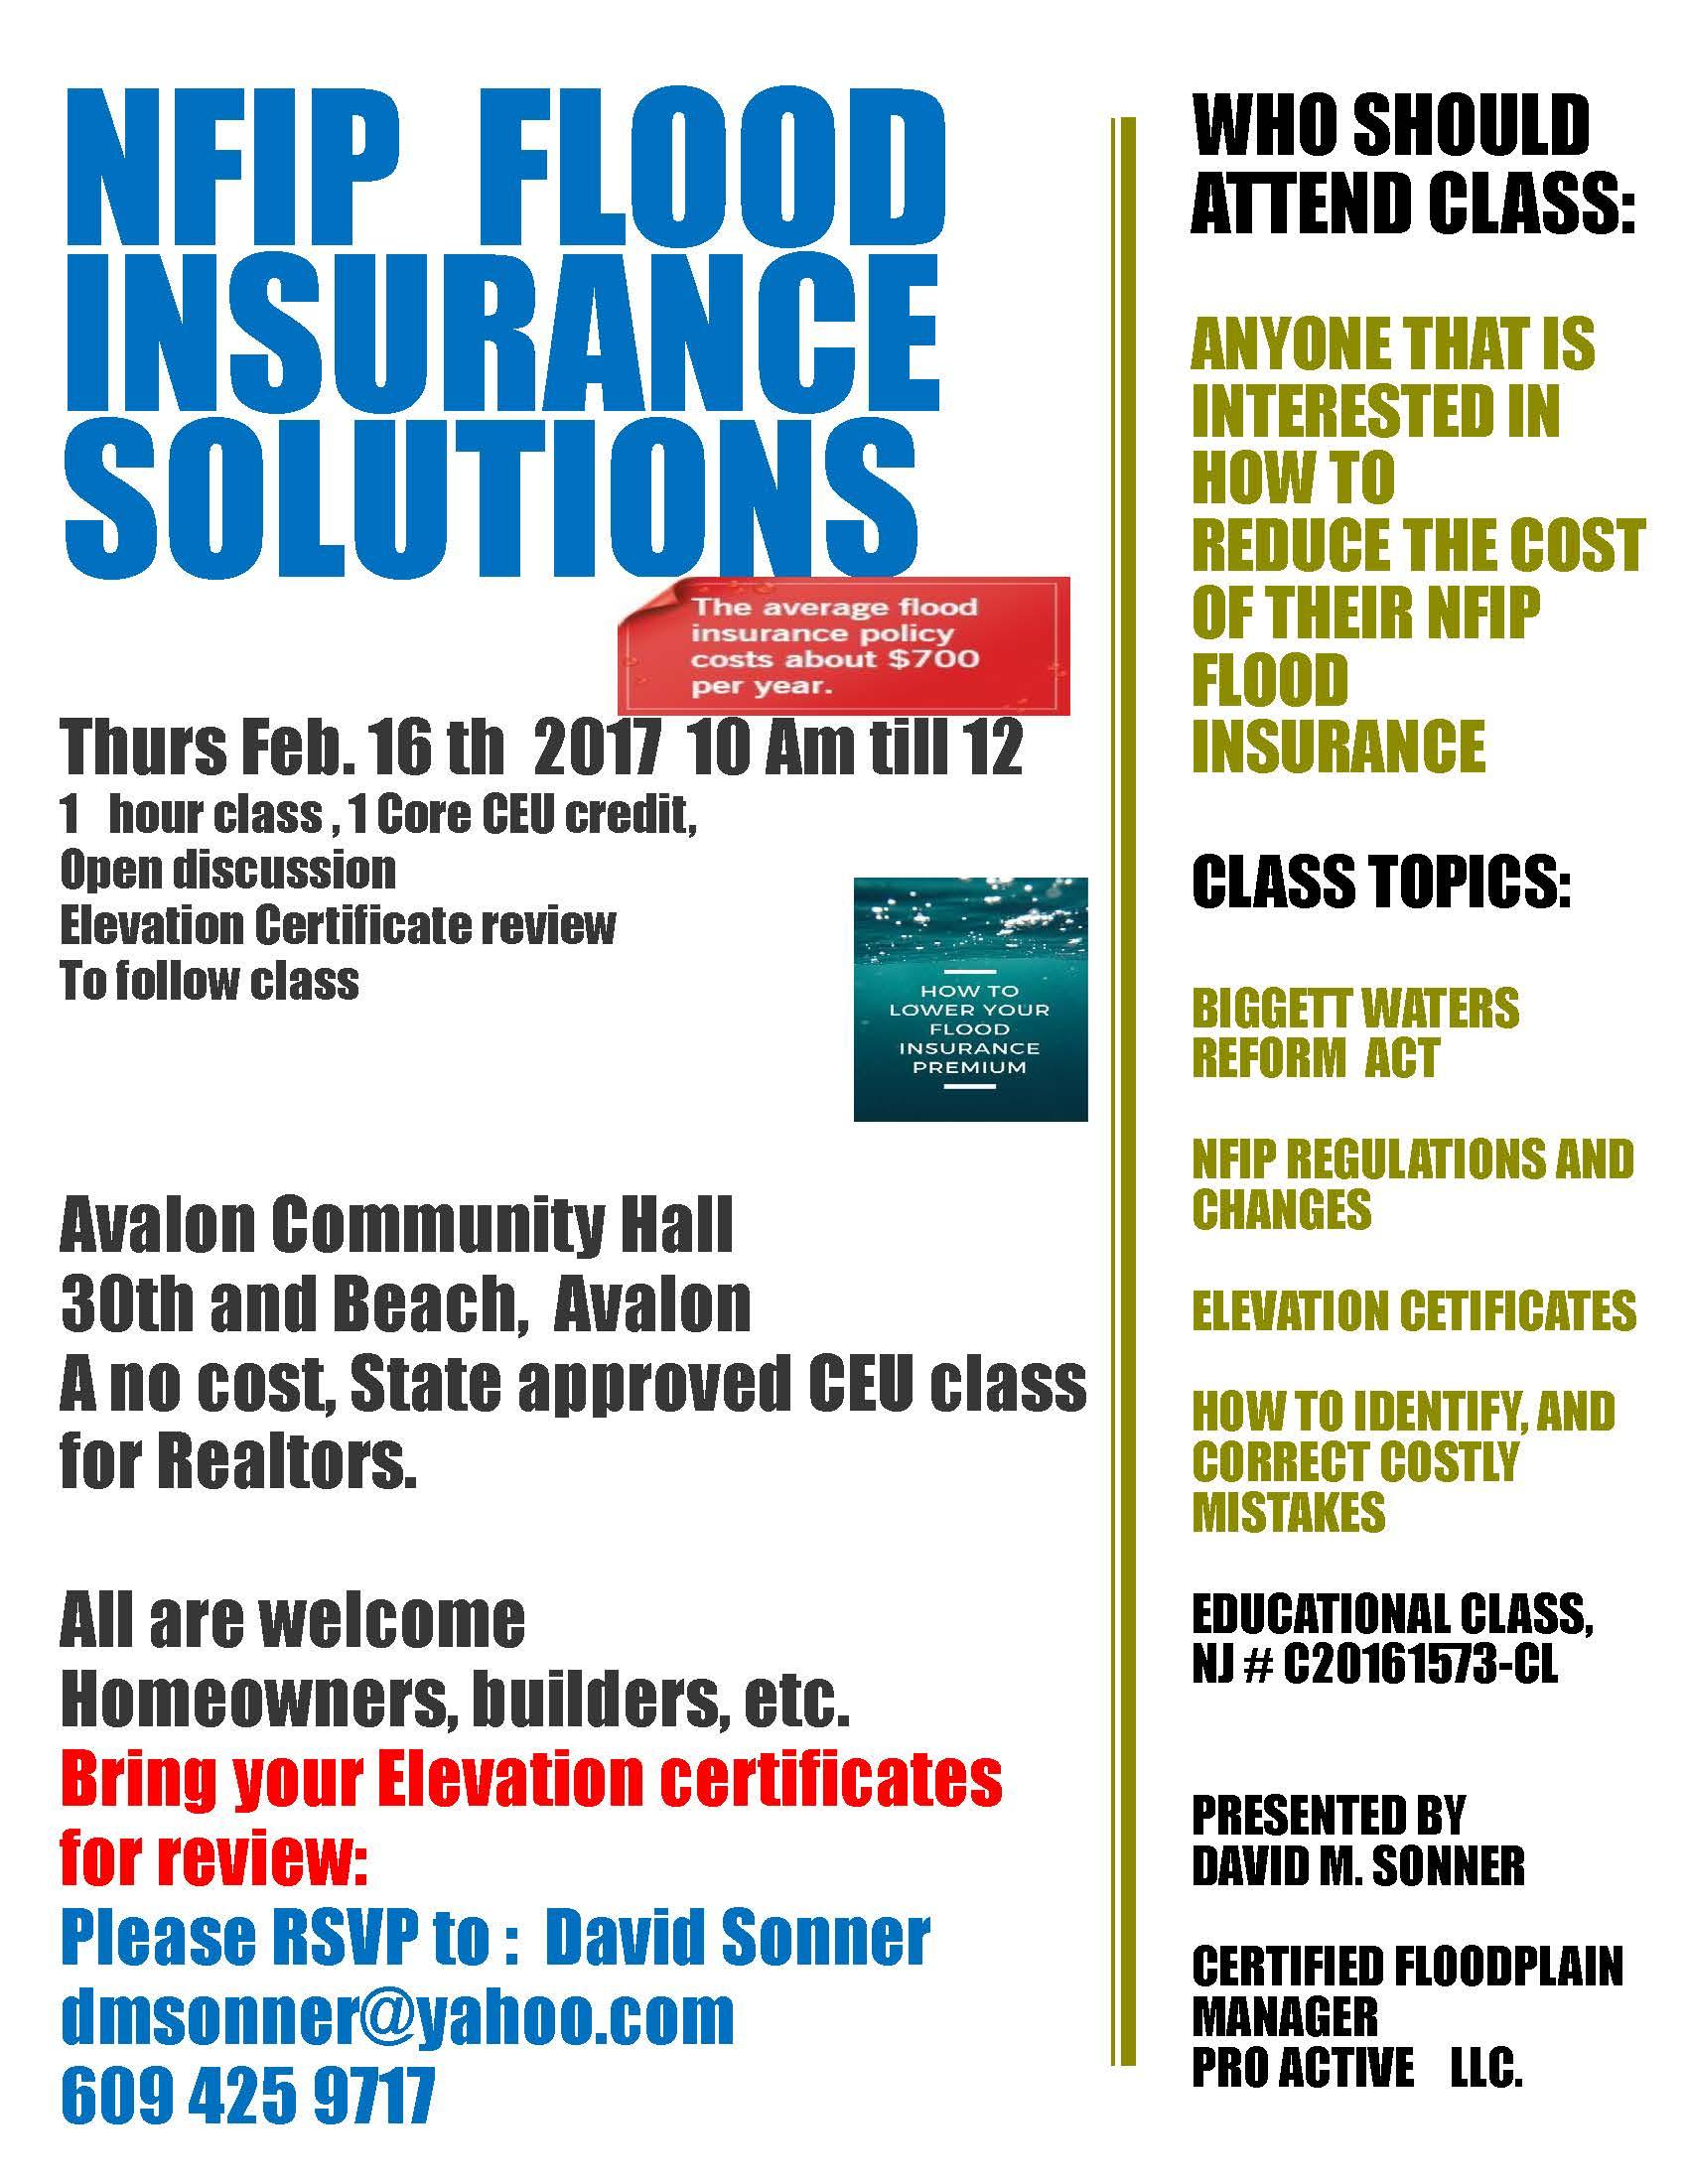 Flood Insurance Premium Reduction Seminar In Avalon Thursday